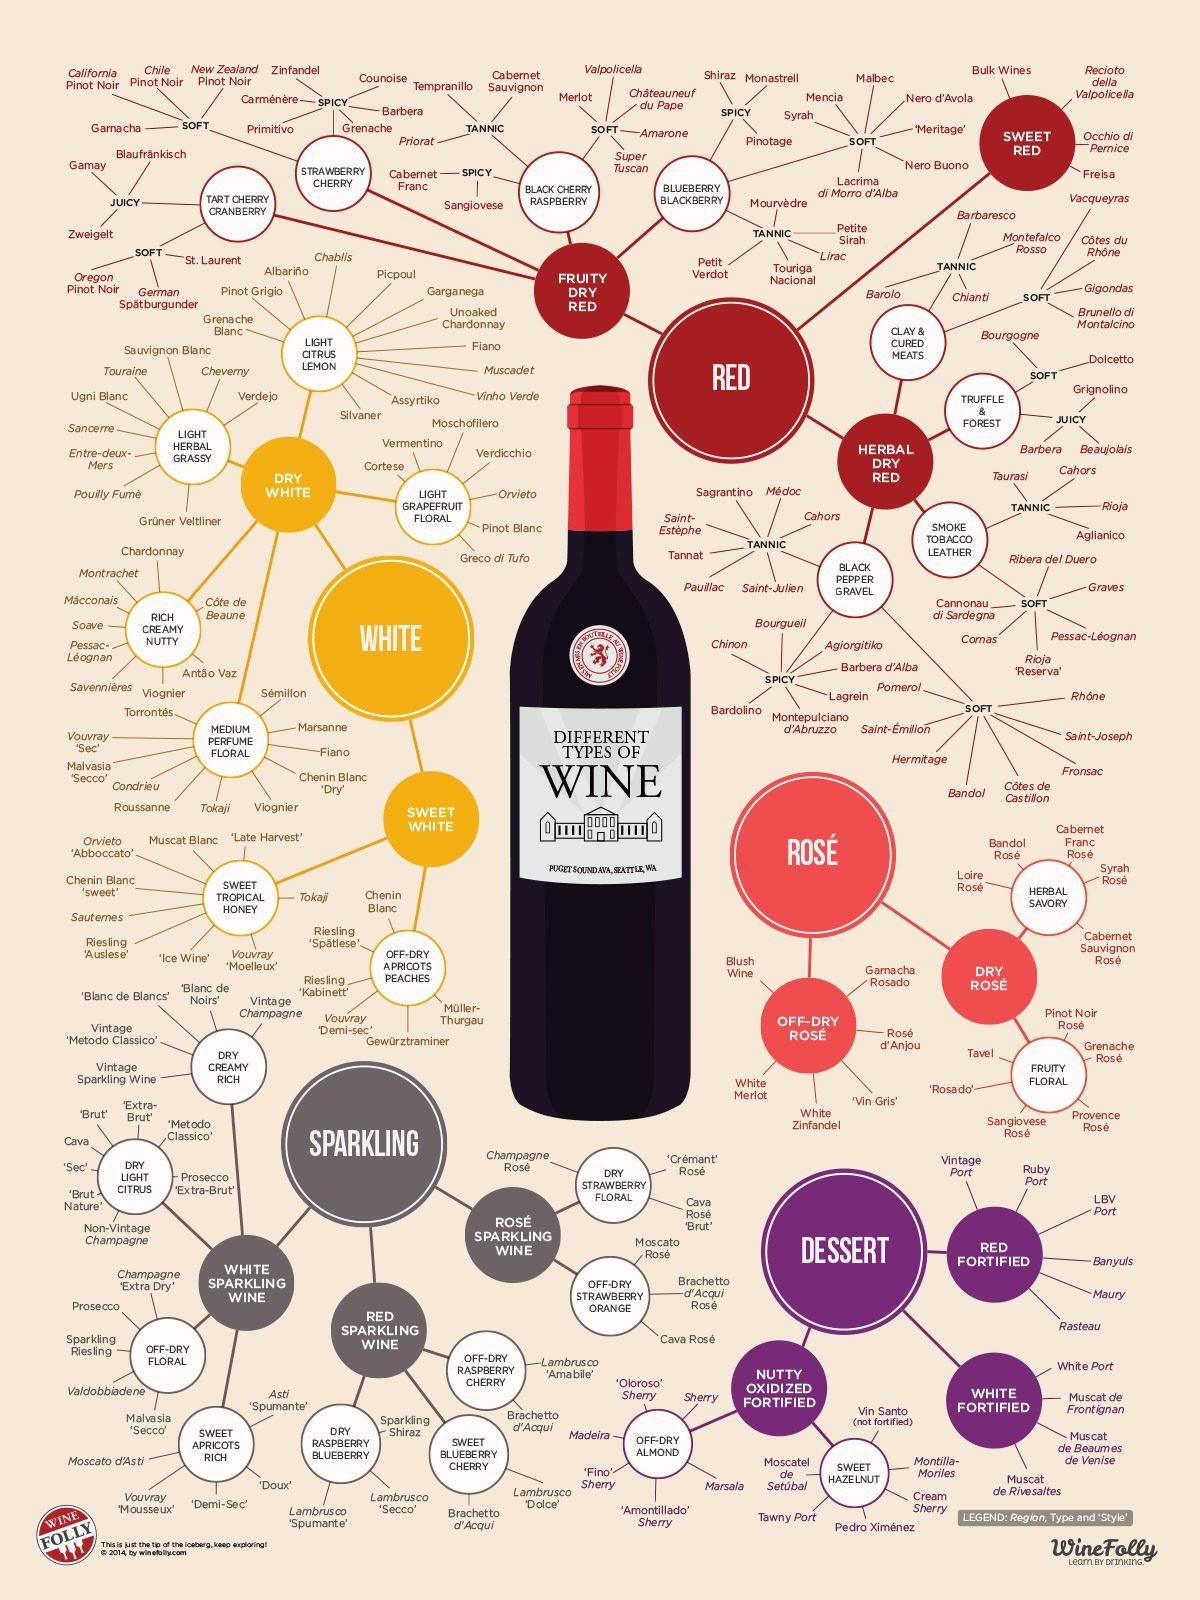 Different-Types-of-Wine-v2